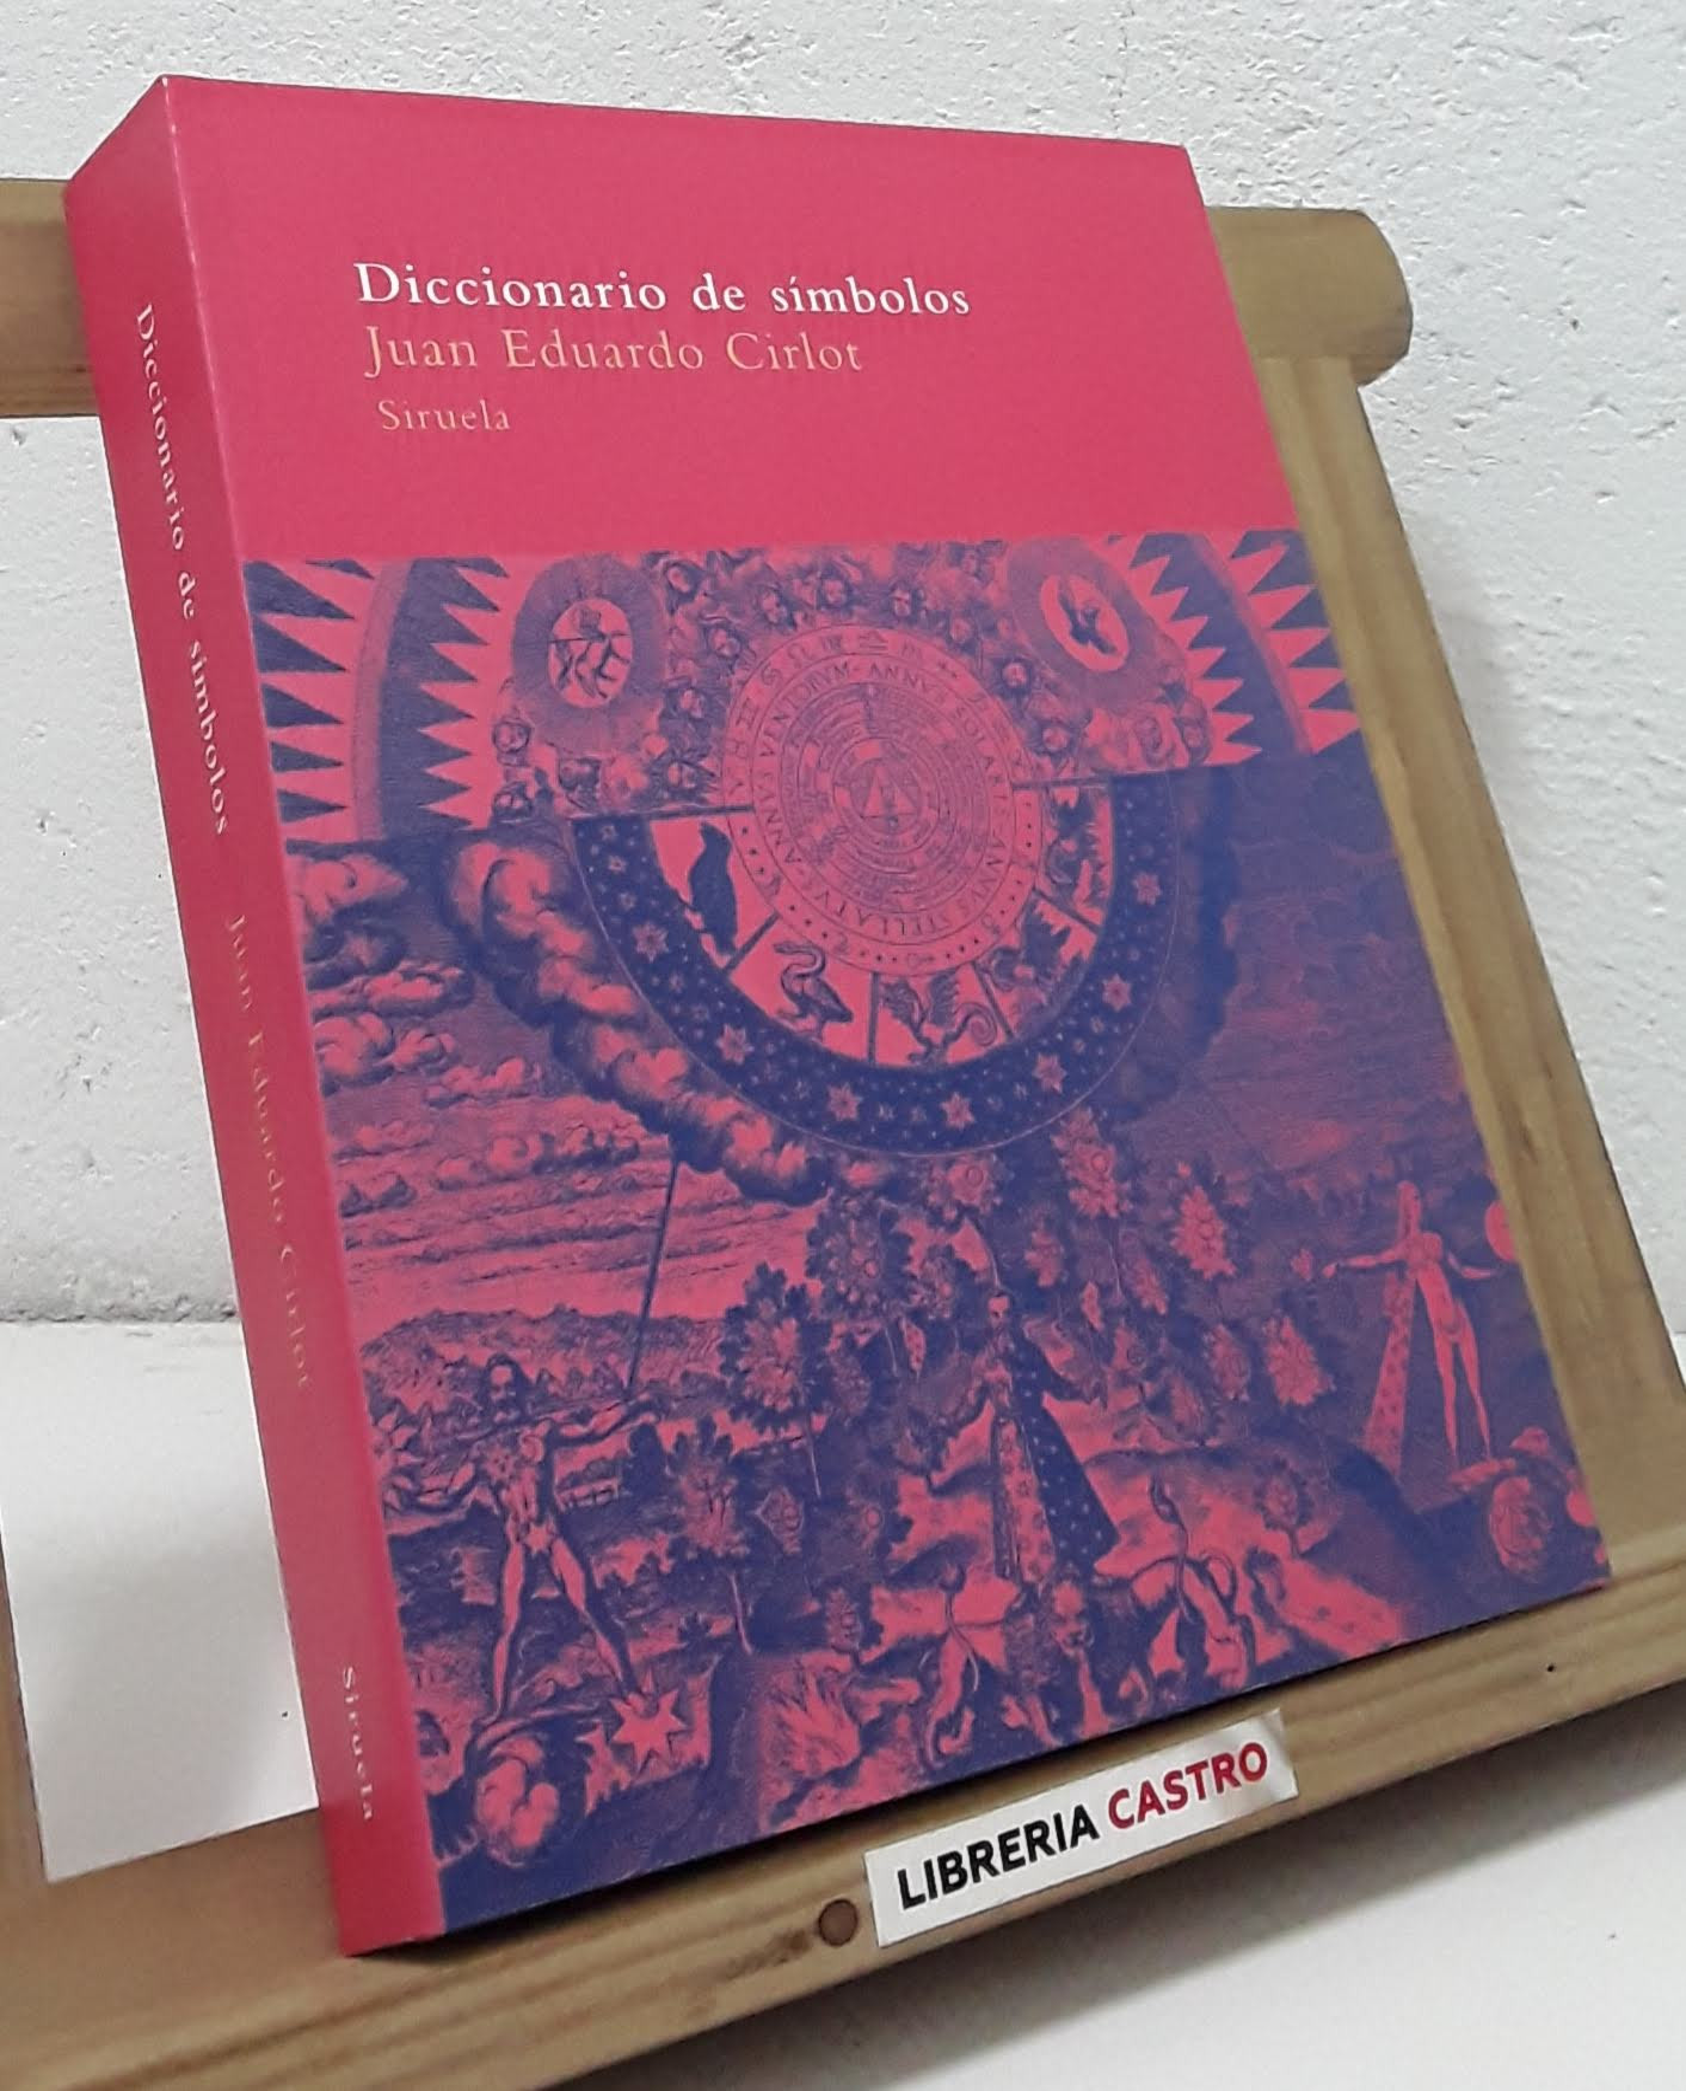 Juan Eduardo Cirlot Diccionario De Simbolos Ebook